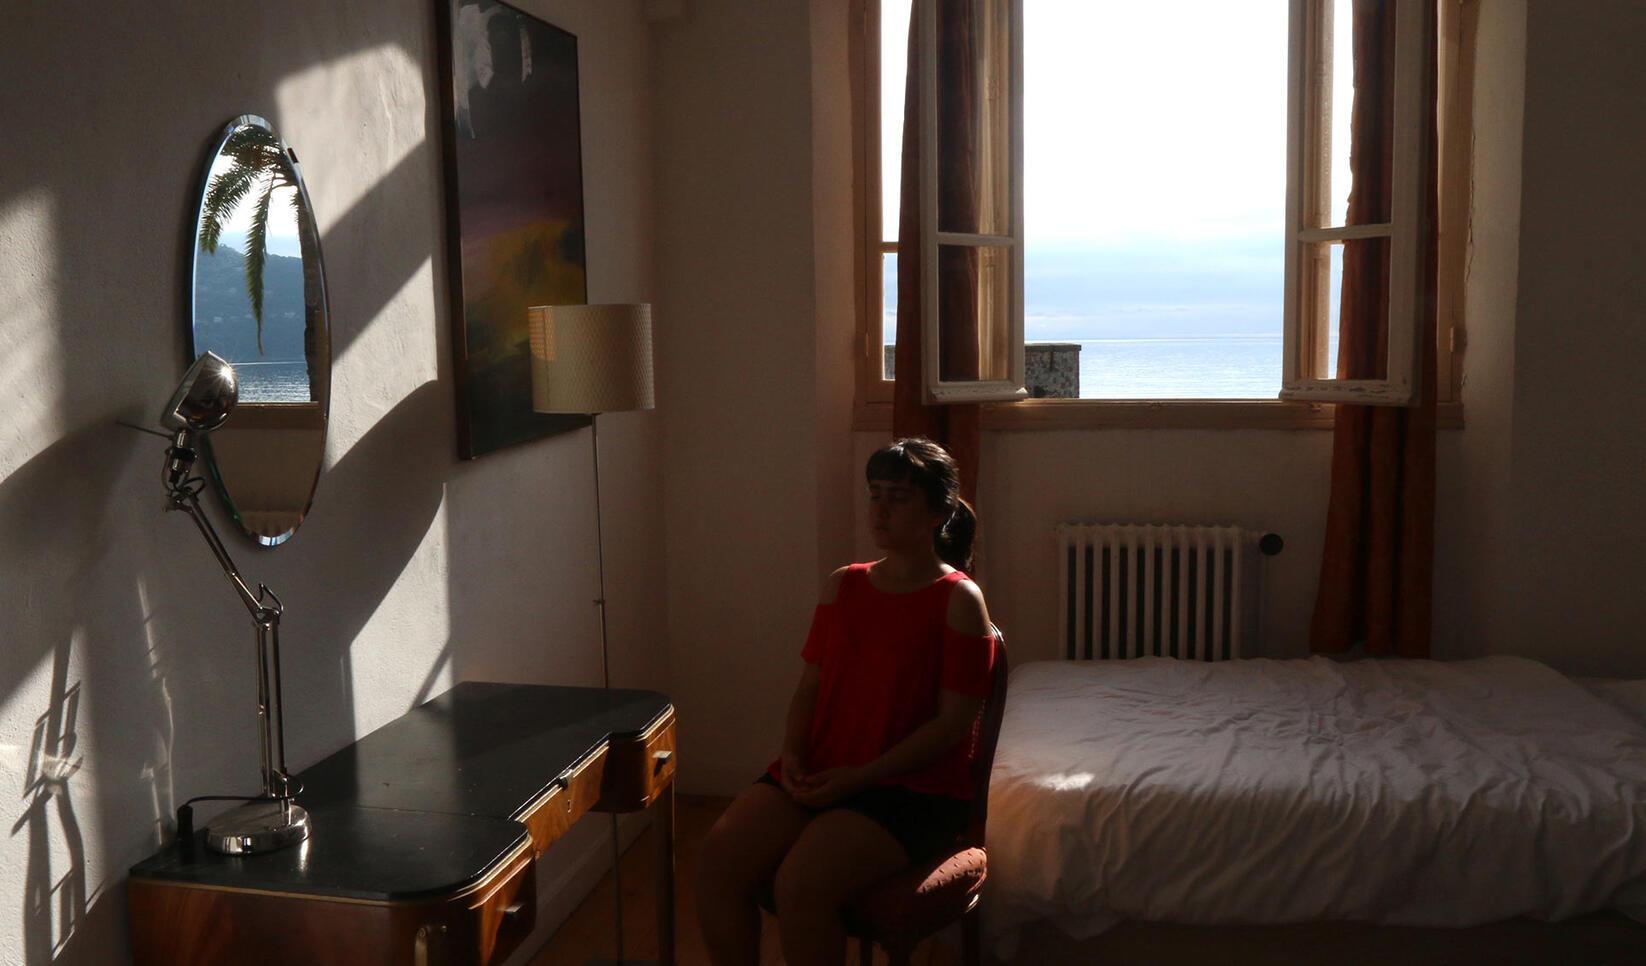 Room (dance time-lapse experiment), 2019, video ; Sarah Abdel-Jelil